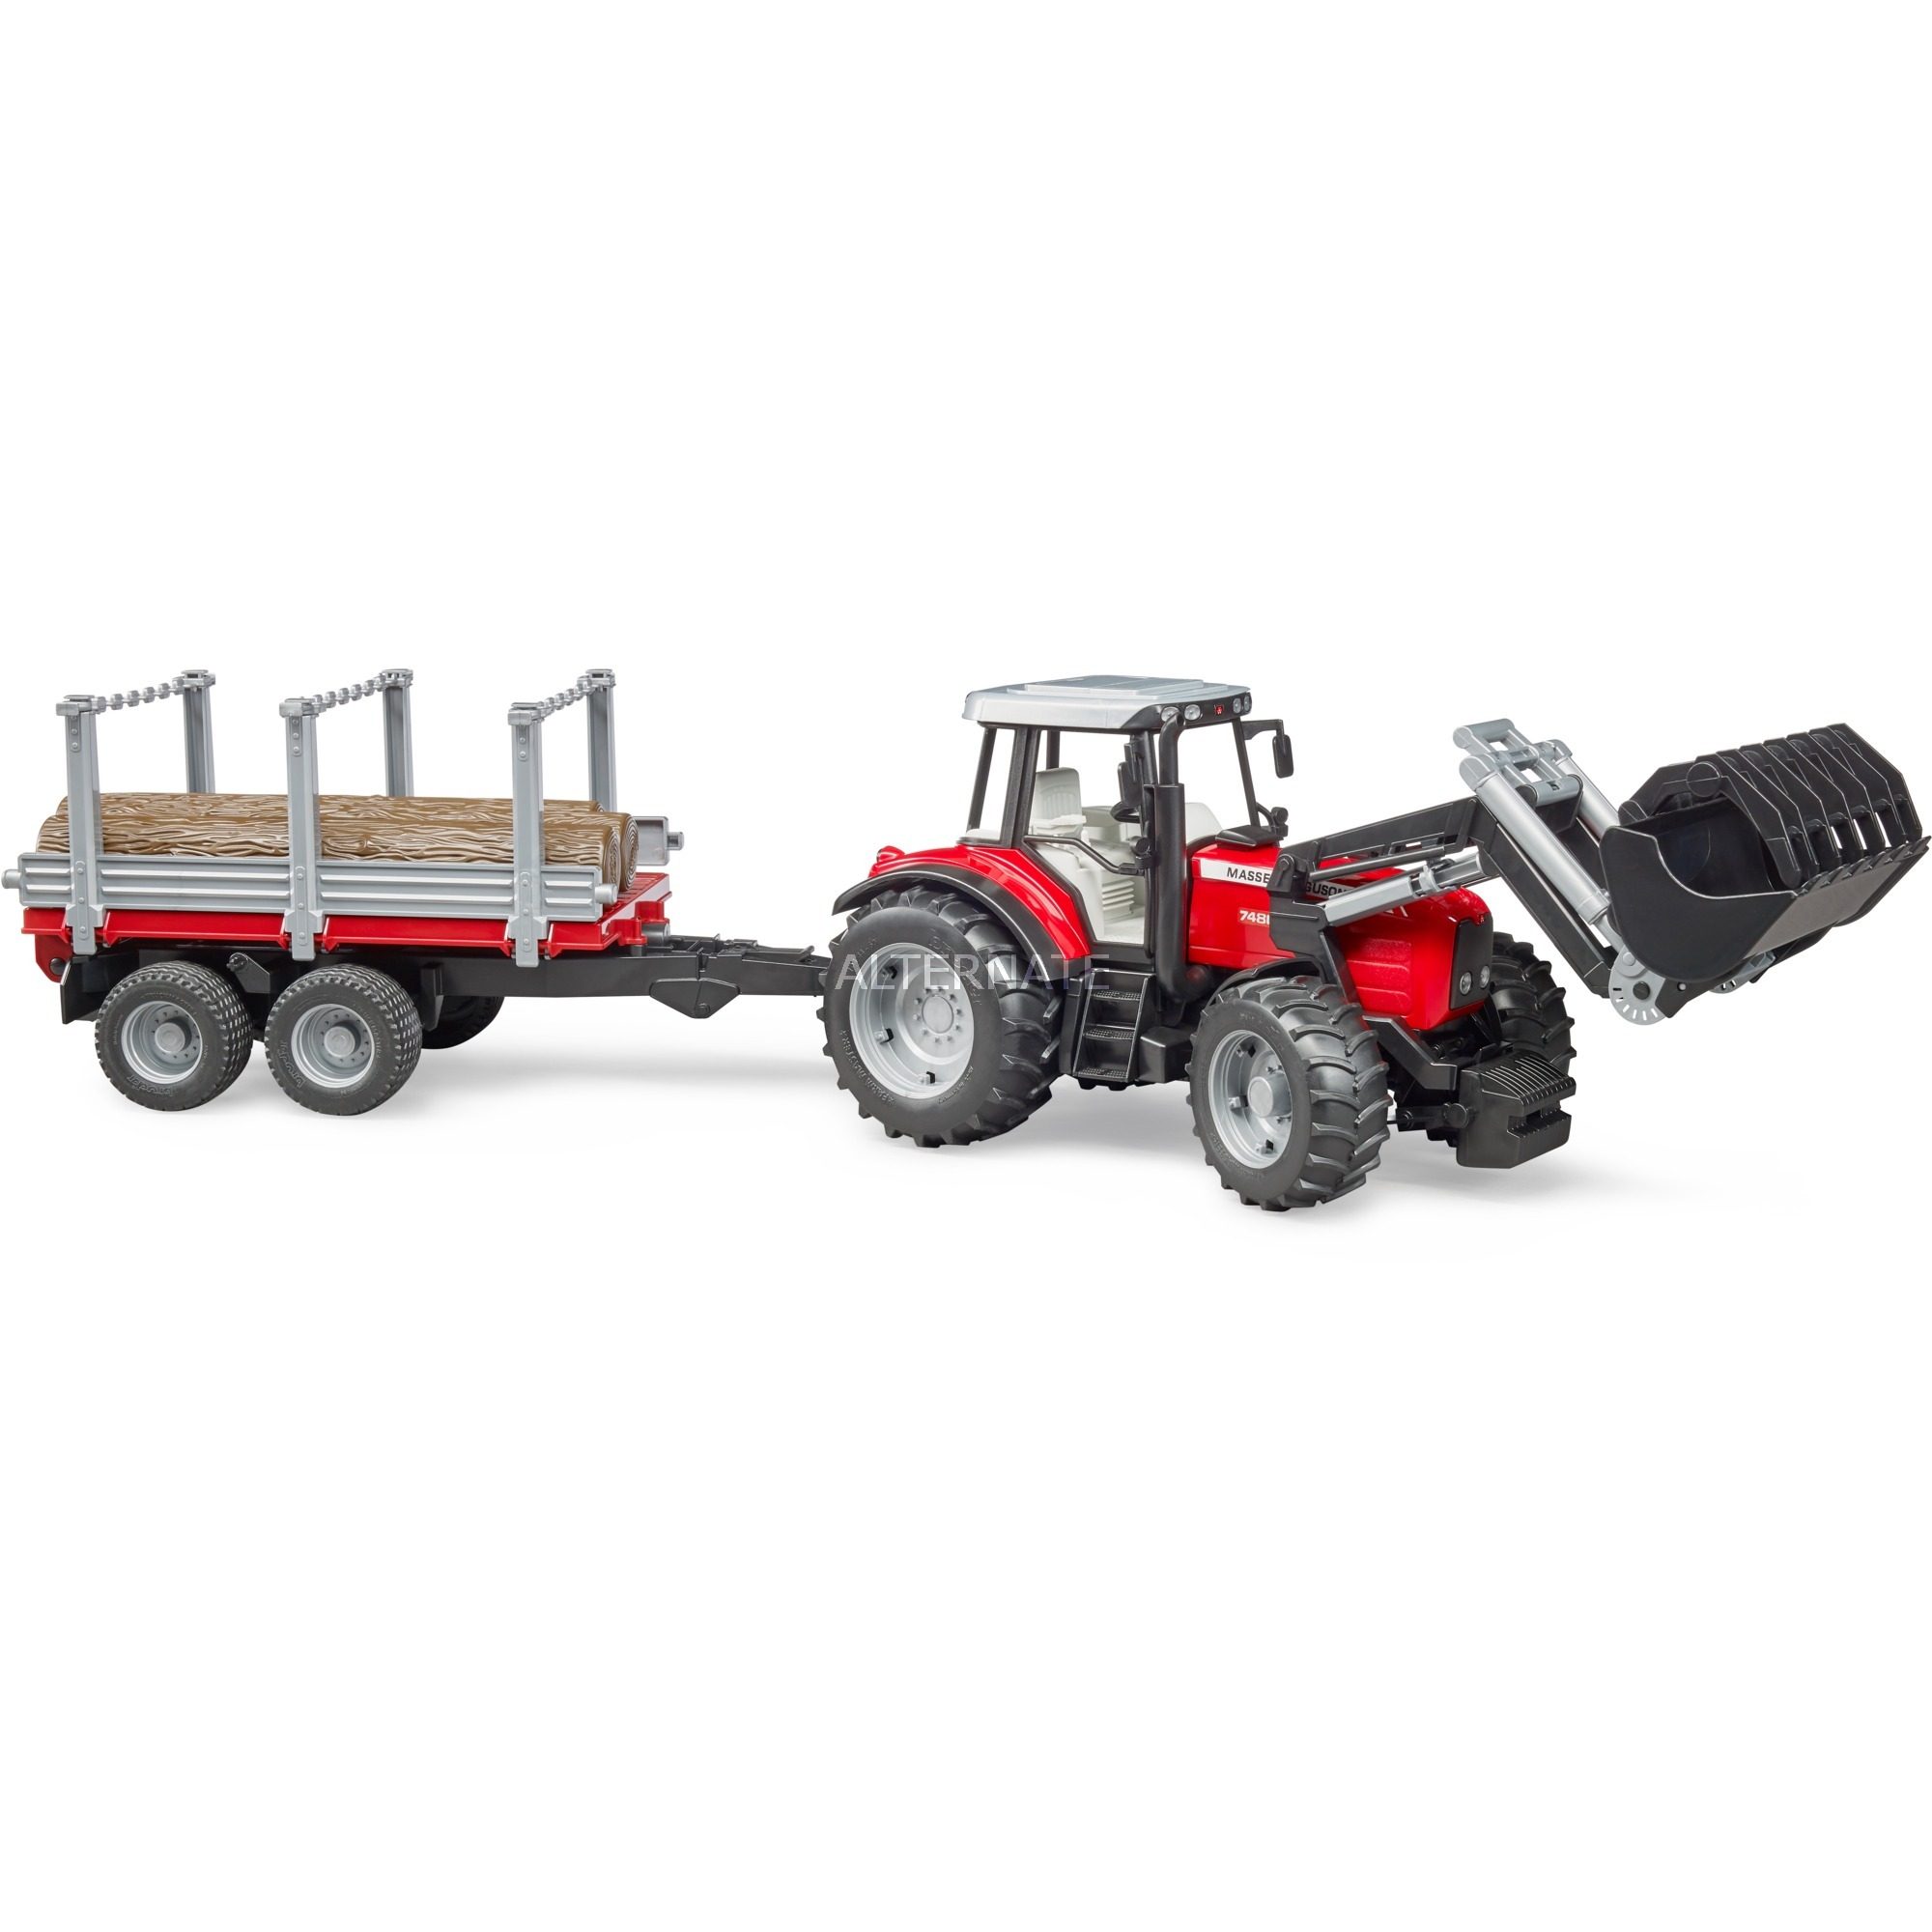 02046 modelo de vehículo de tierra Previamente montado Modelo a escala de tractor 1:16, Automóvil de construcción